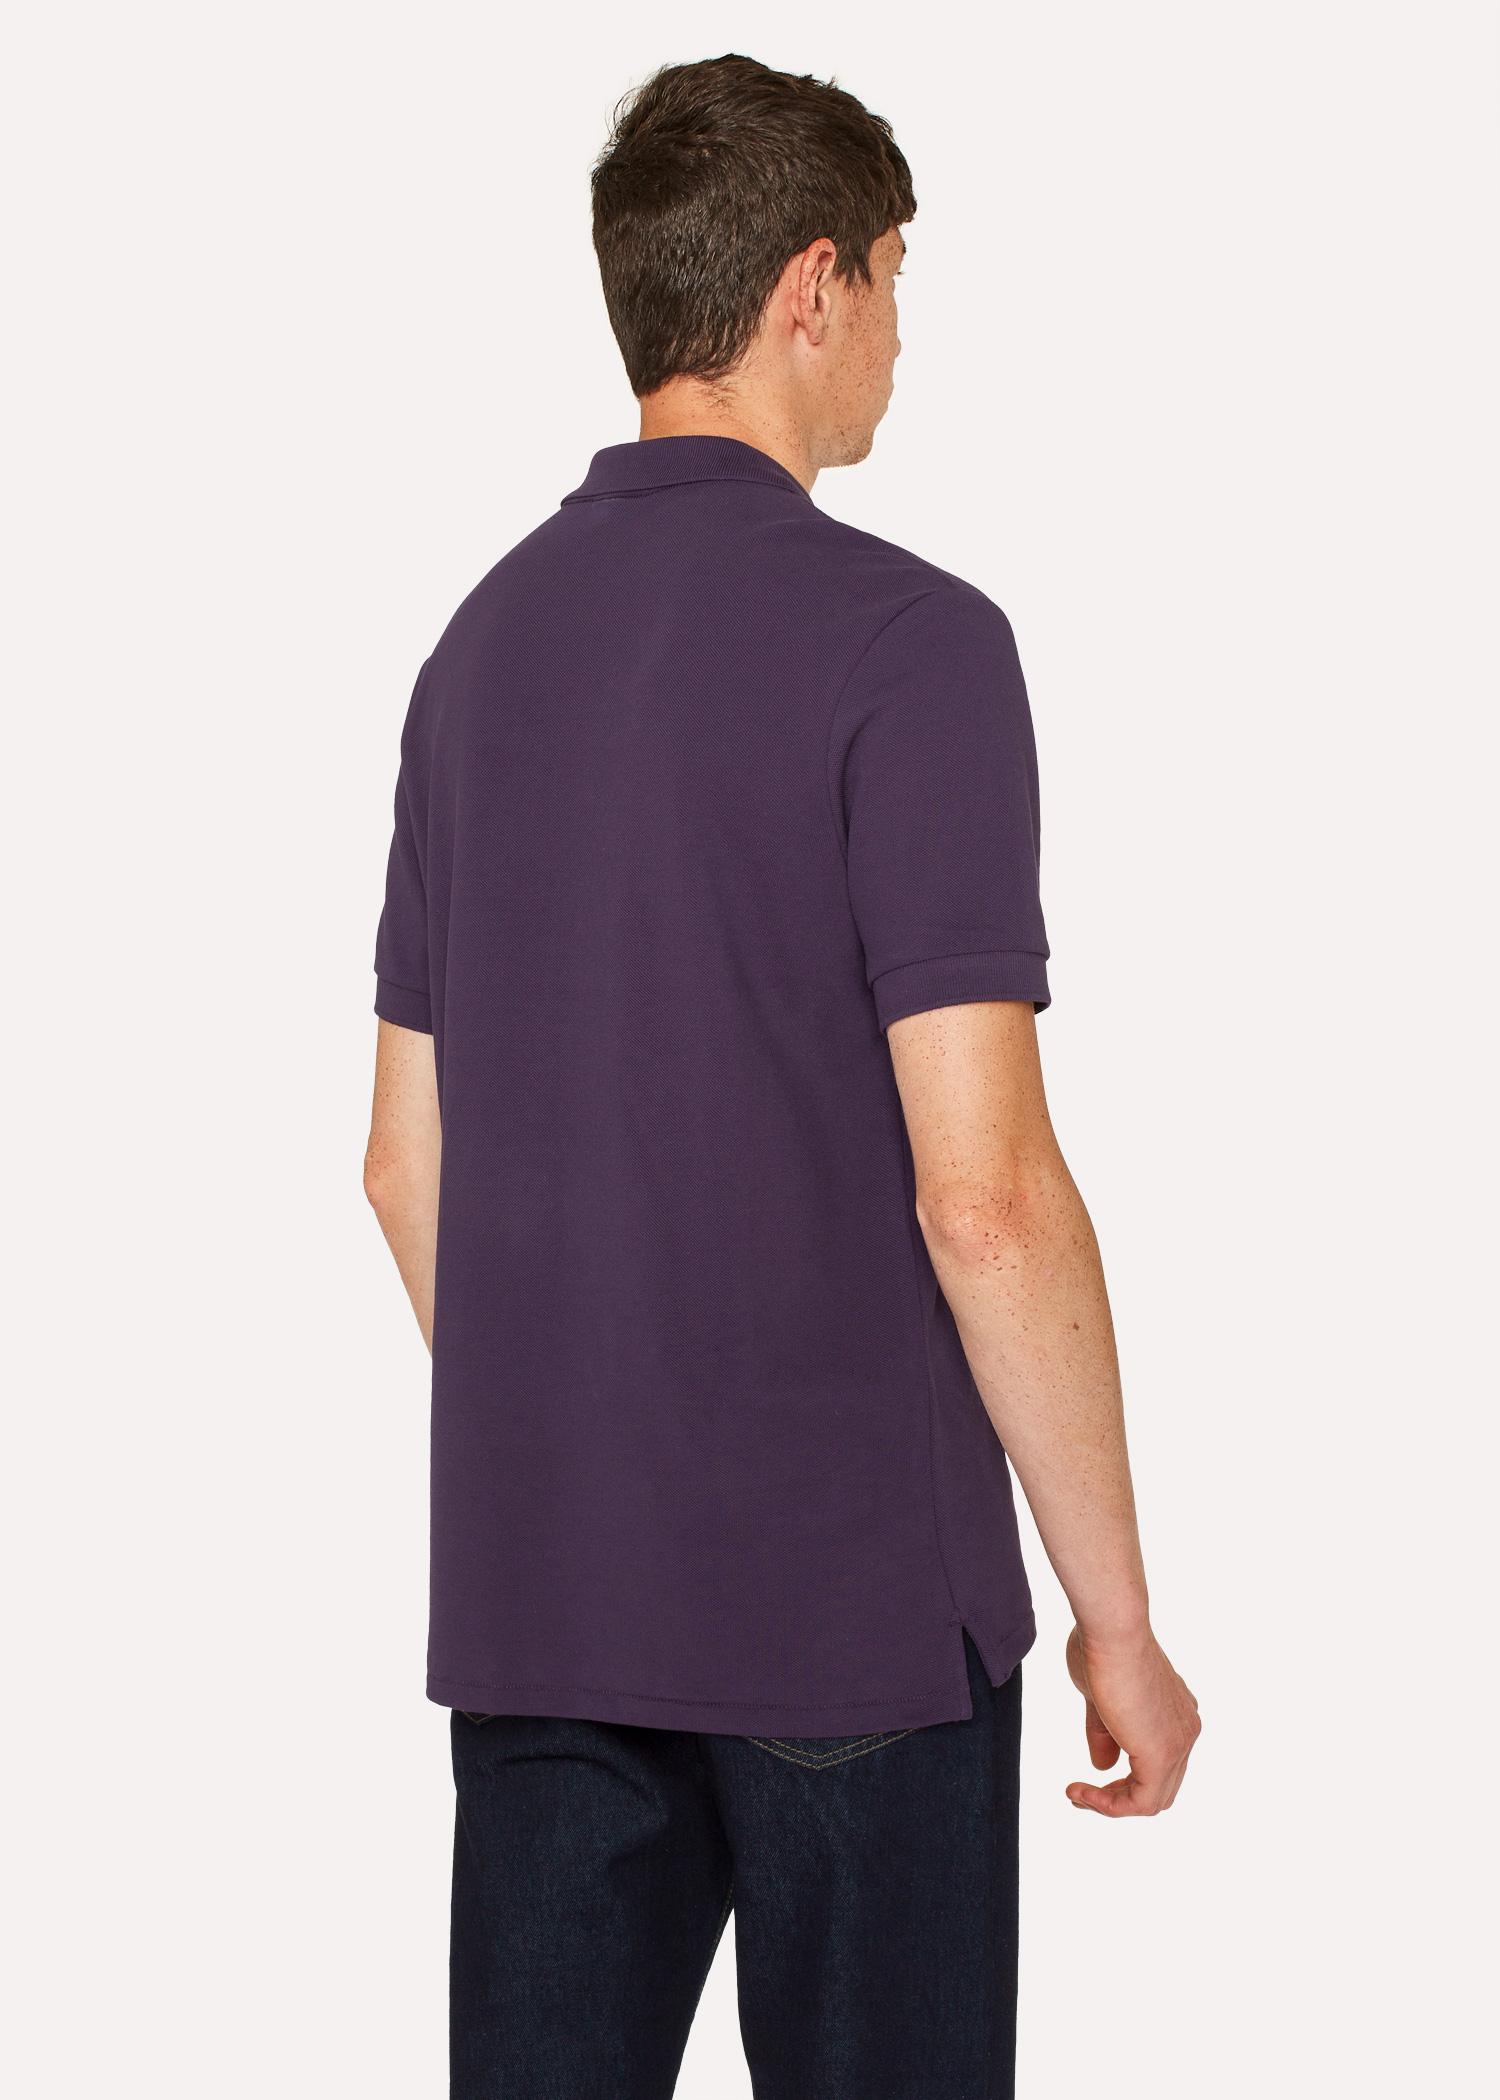 Mens Dark Violet Organic Cotton Piqu Zebra Logo Polo Shirt Paul